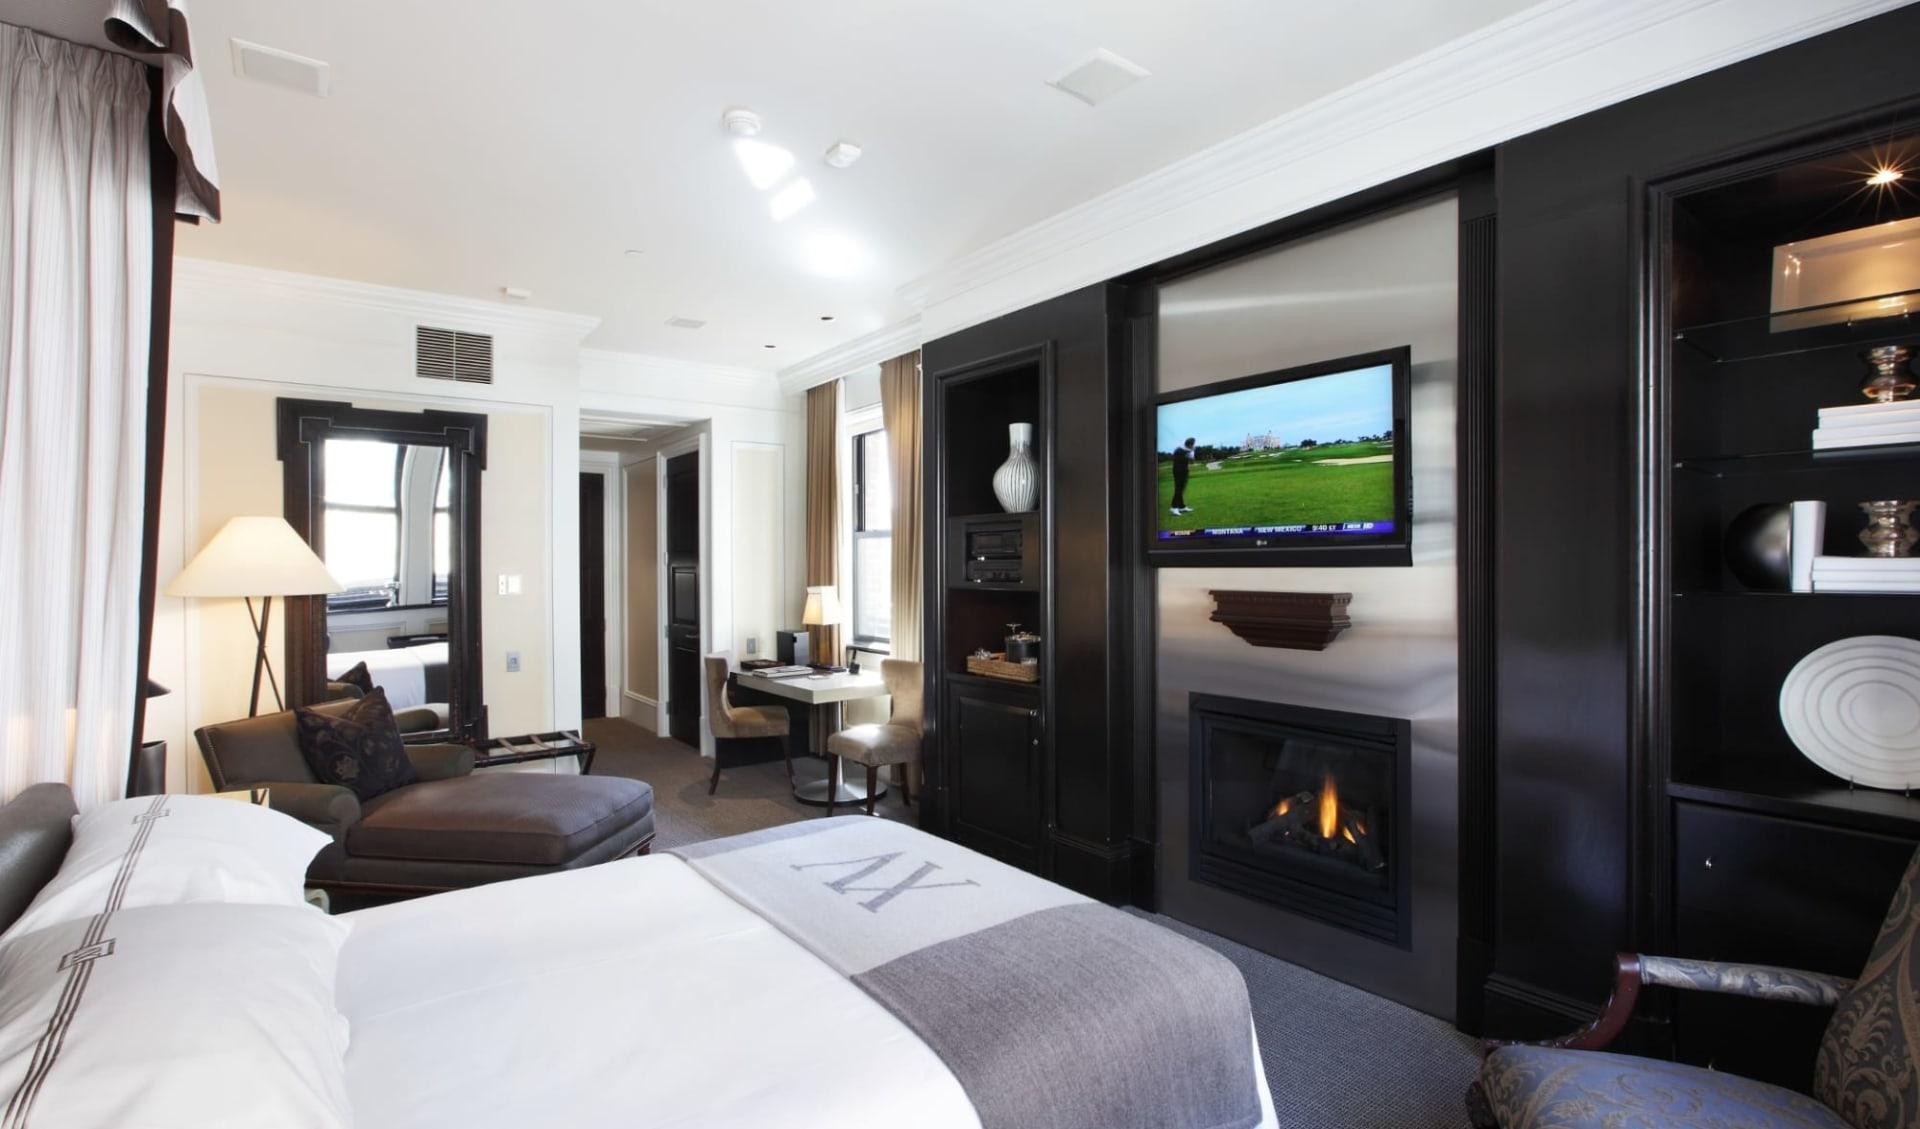 XV Beacon Hotel in Boston:  XV_Beacon_contemporary_classic